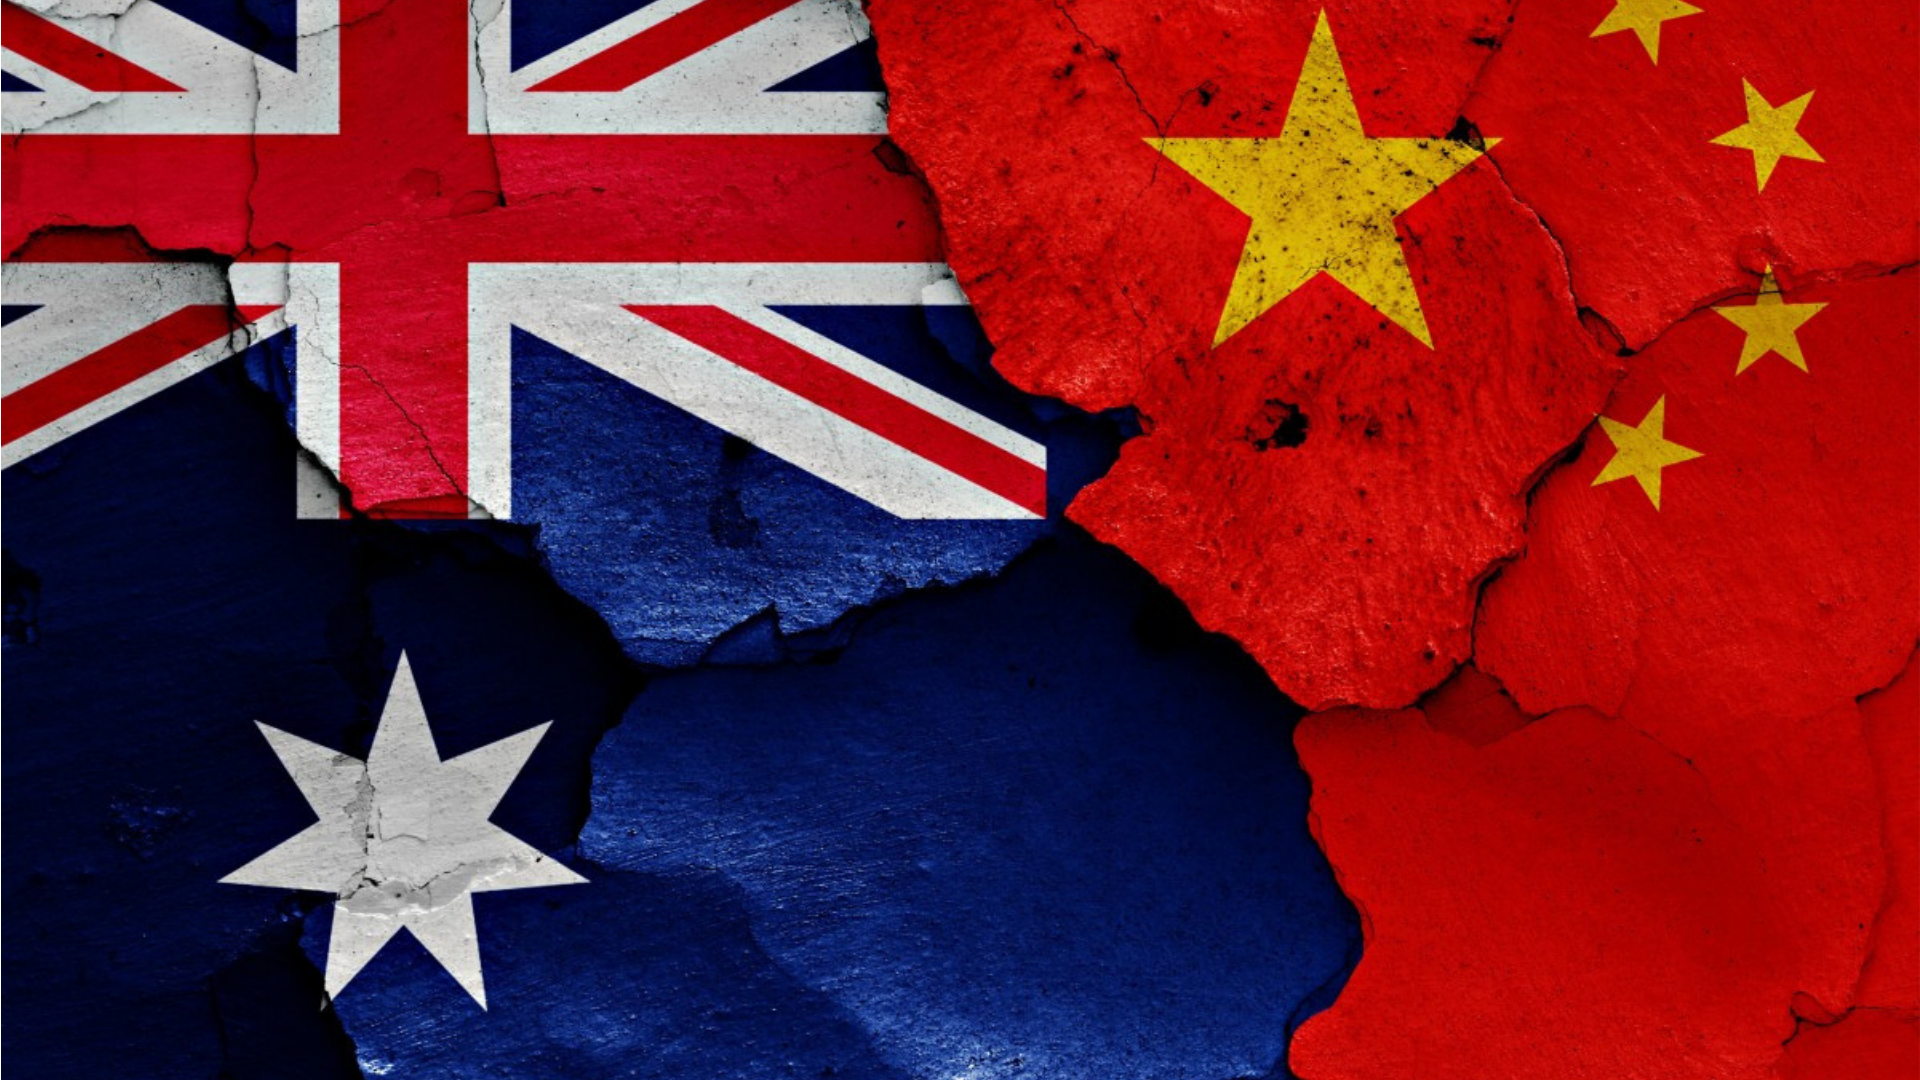 Australia's response to China's rise